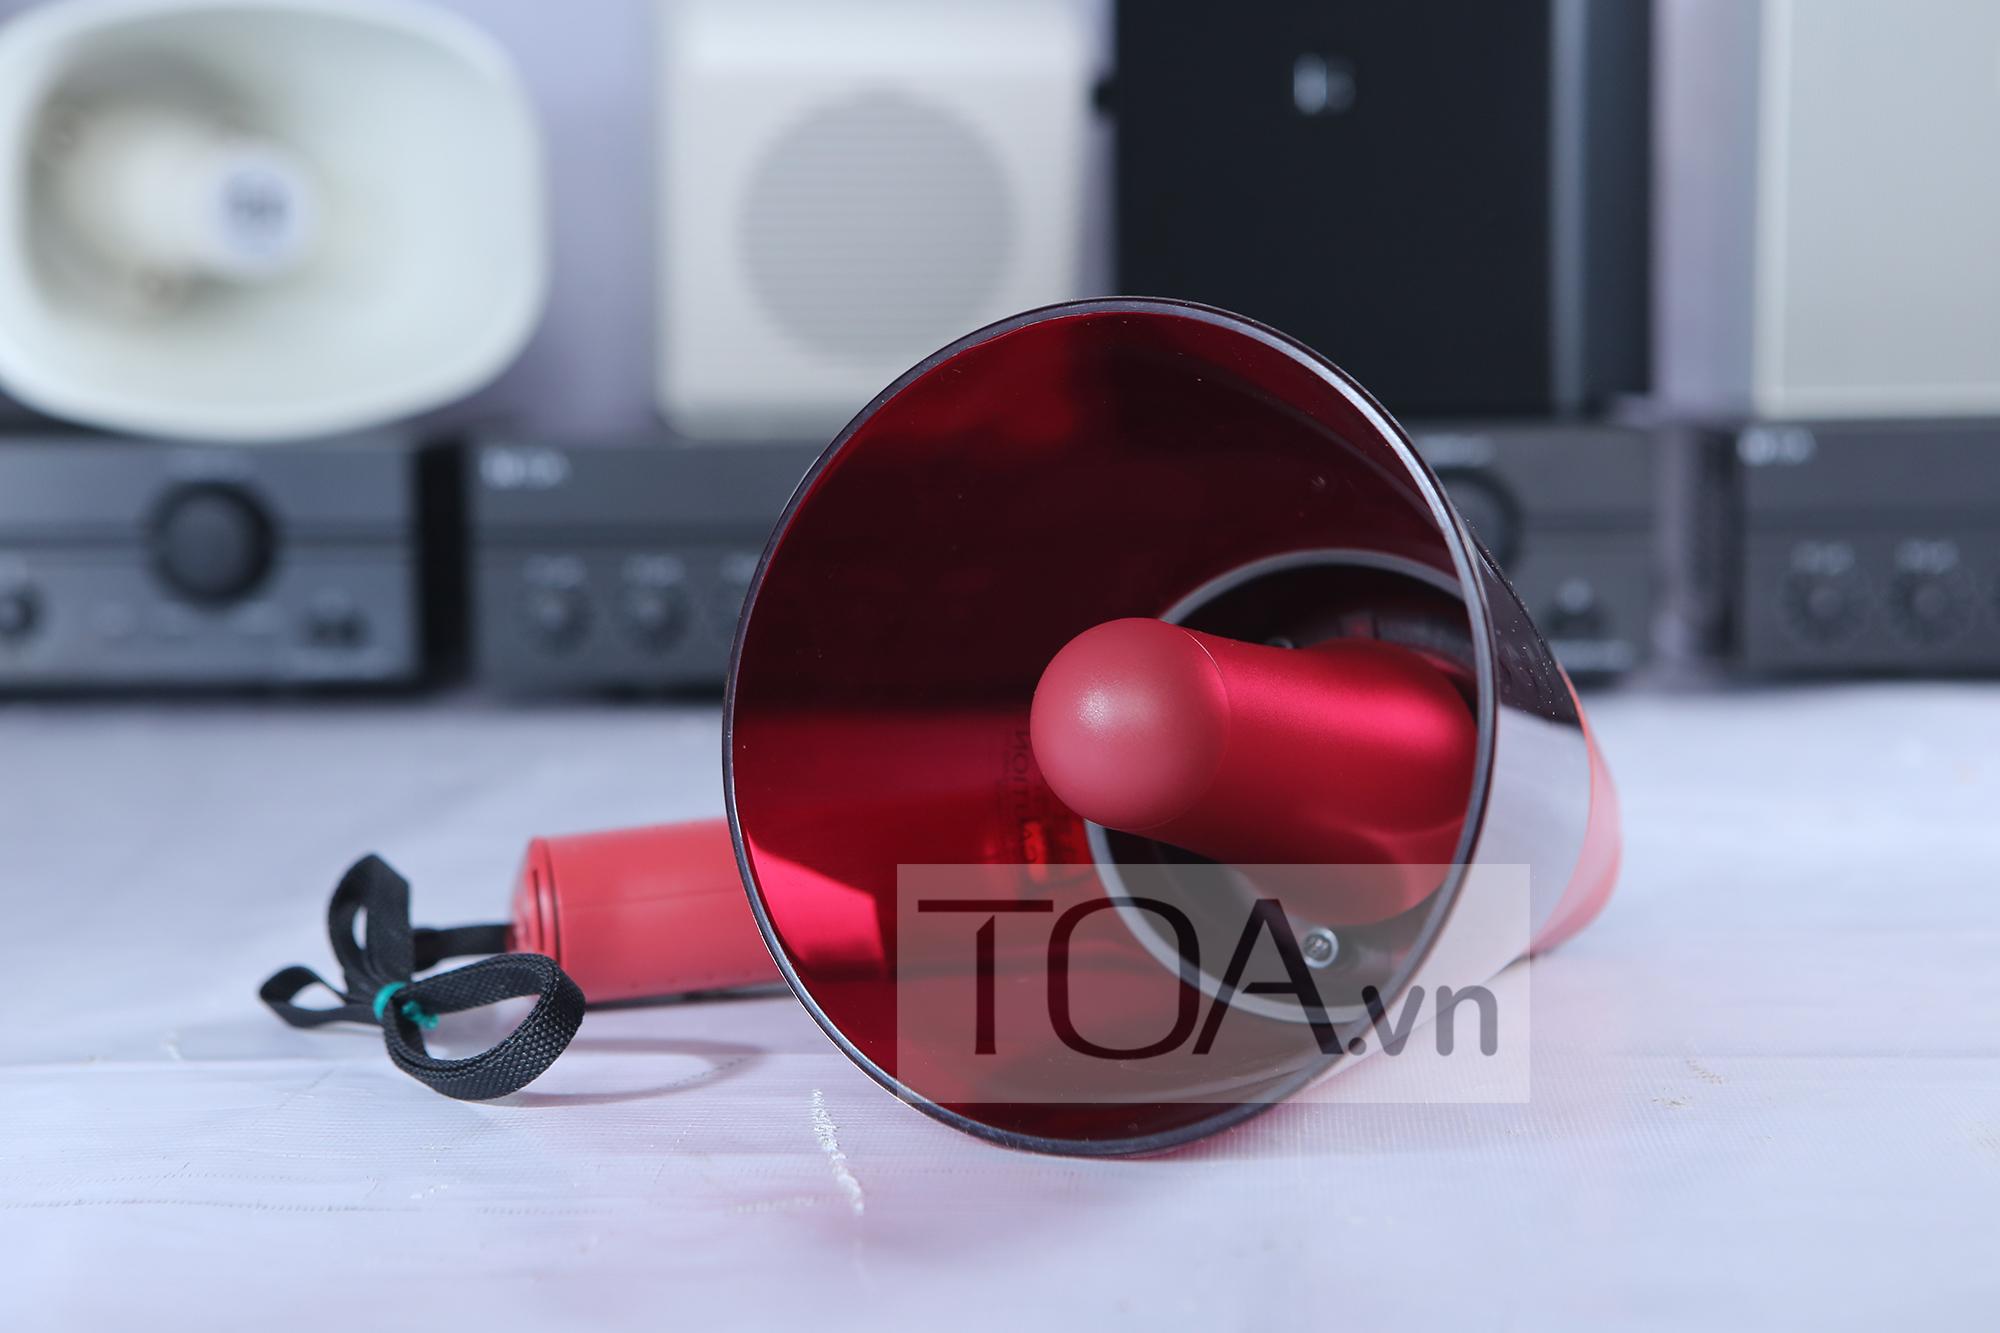 MEGAPHONE CAM TAY CHONG NUOC TOA ER 1206S, MEGAPHONE TOA ER 1206S, ER 1206S